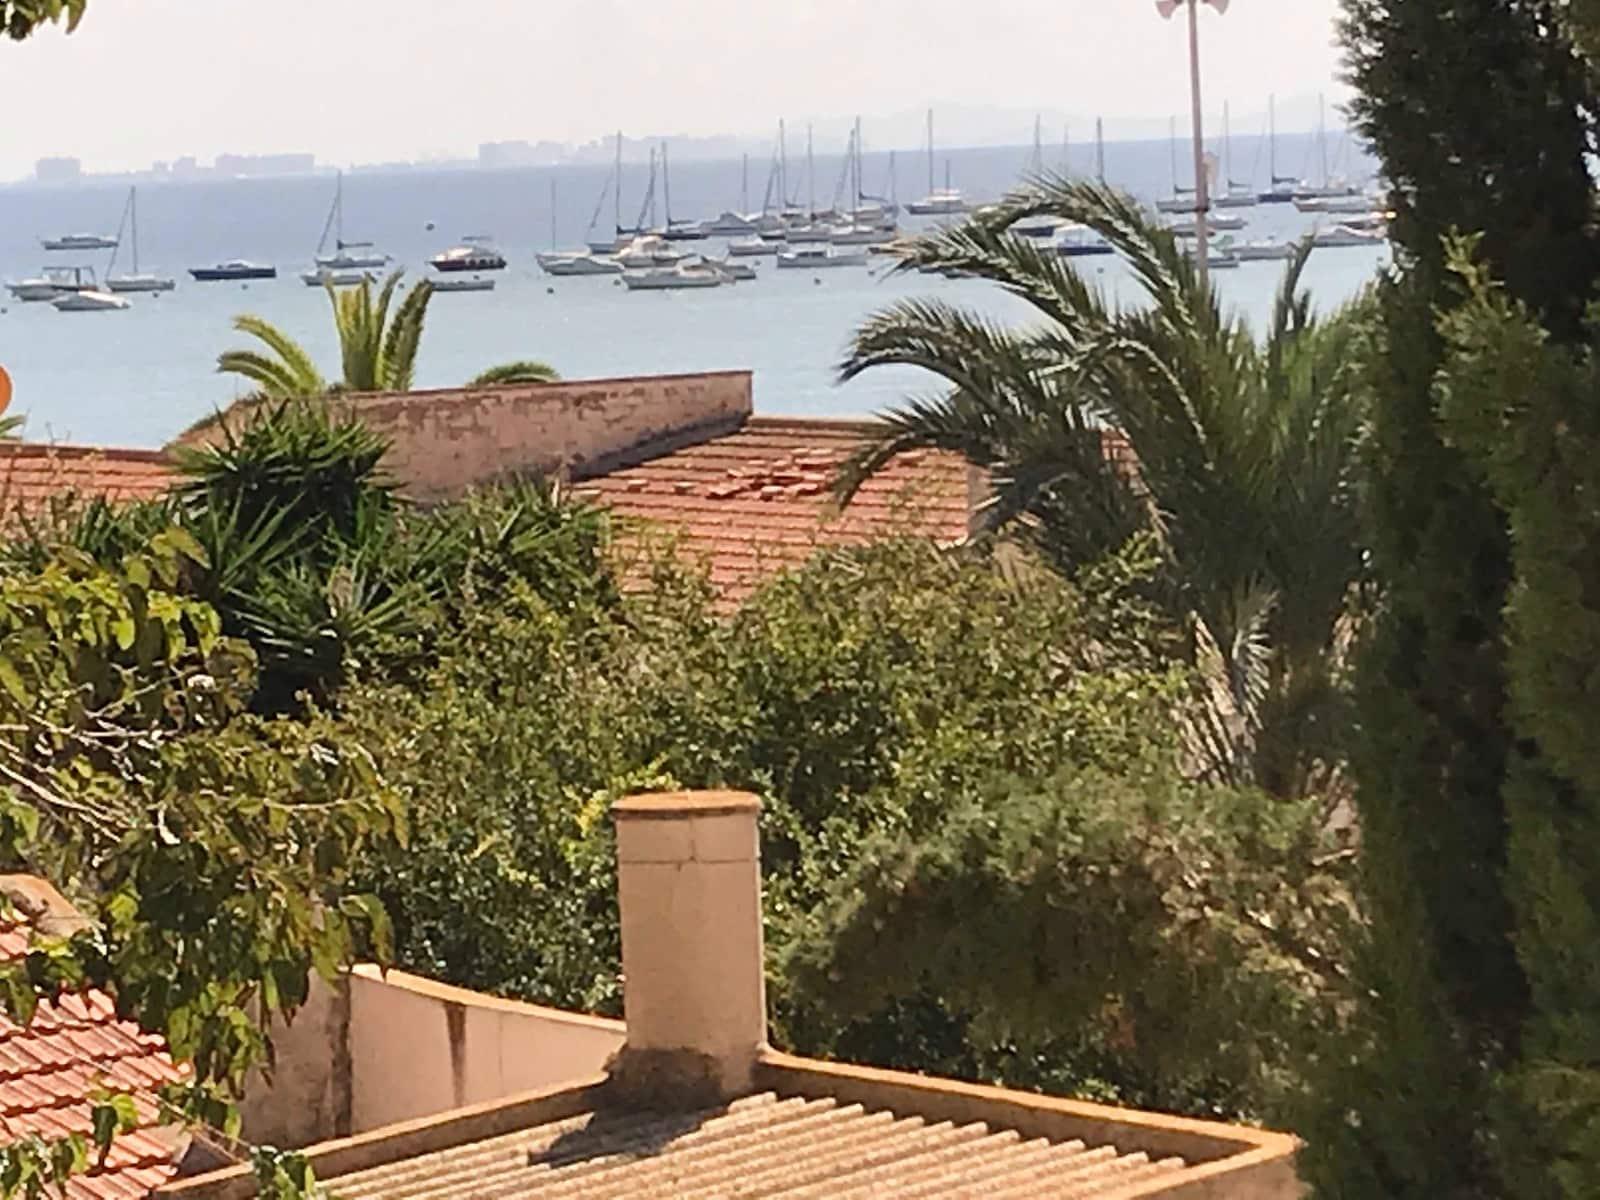 2 chambre Appartement à vendre à San Pedro del Pinatar avec garage - 120 000 € (Ref: 4810434)